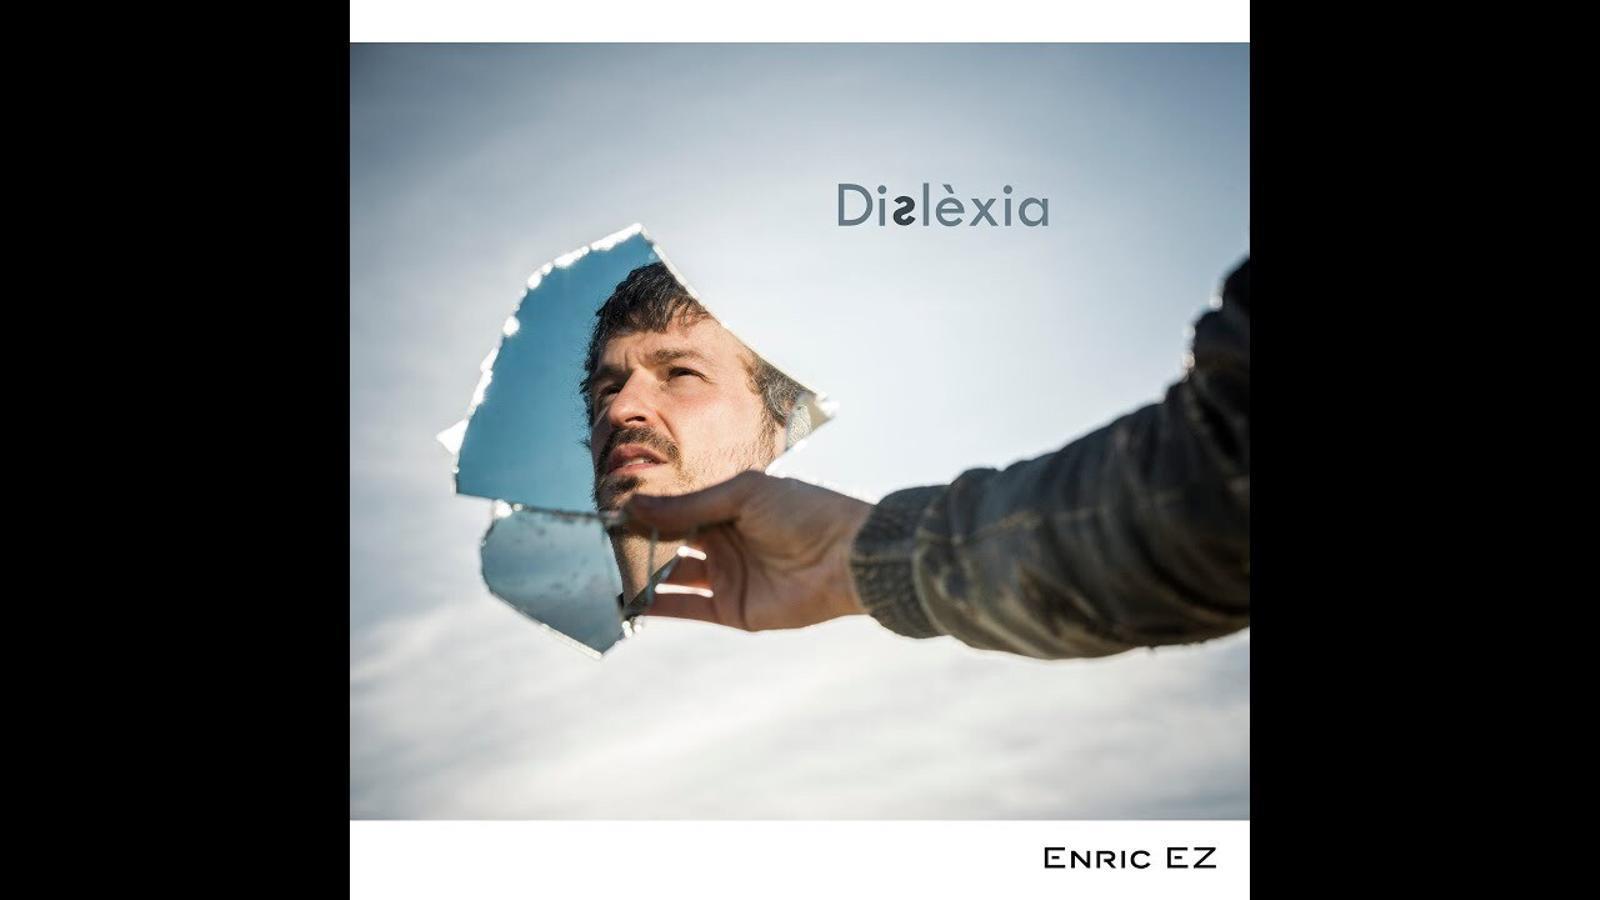 Enric EZ, 'Dislèxia', videoclip